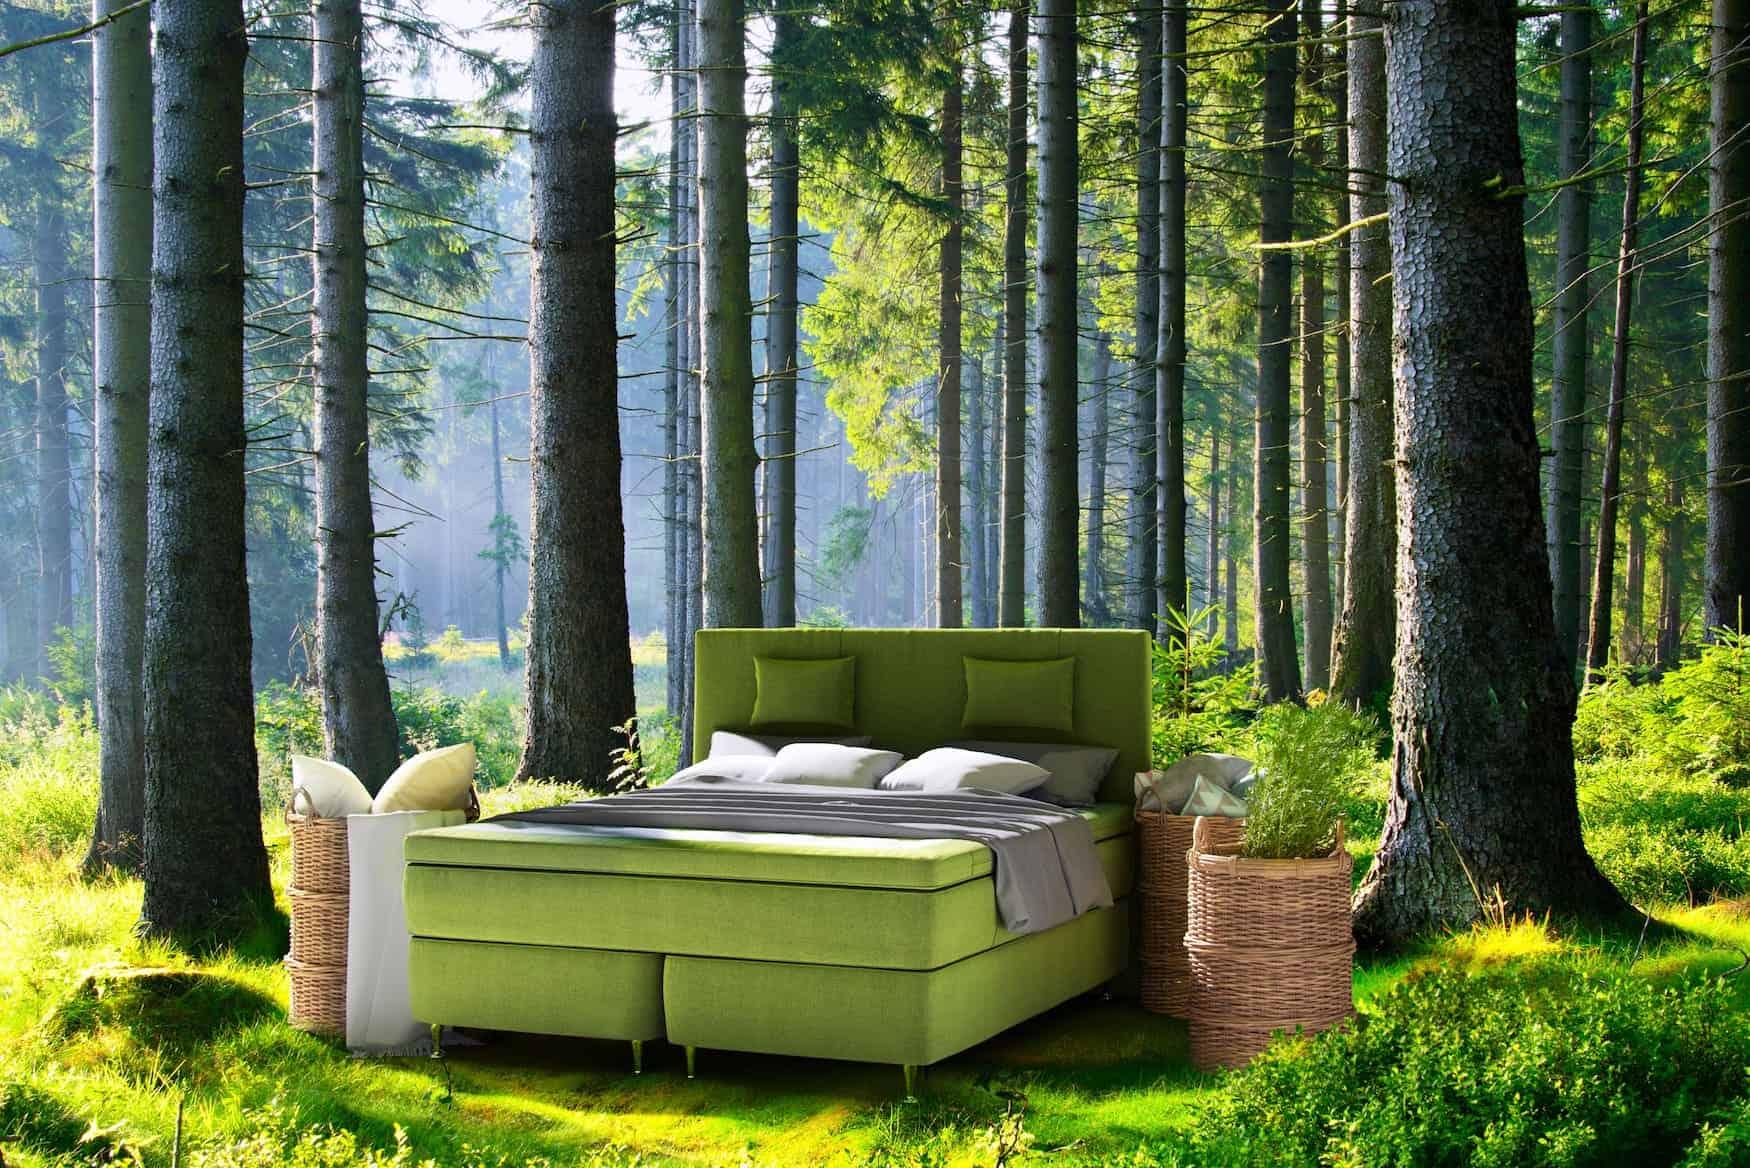 PRESSURE Ecolife Beds